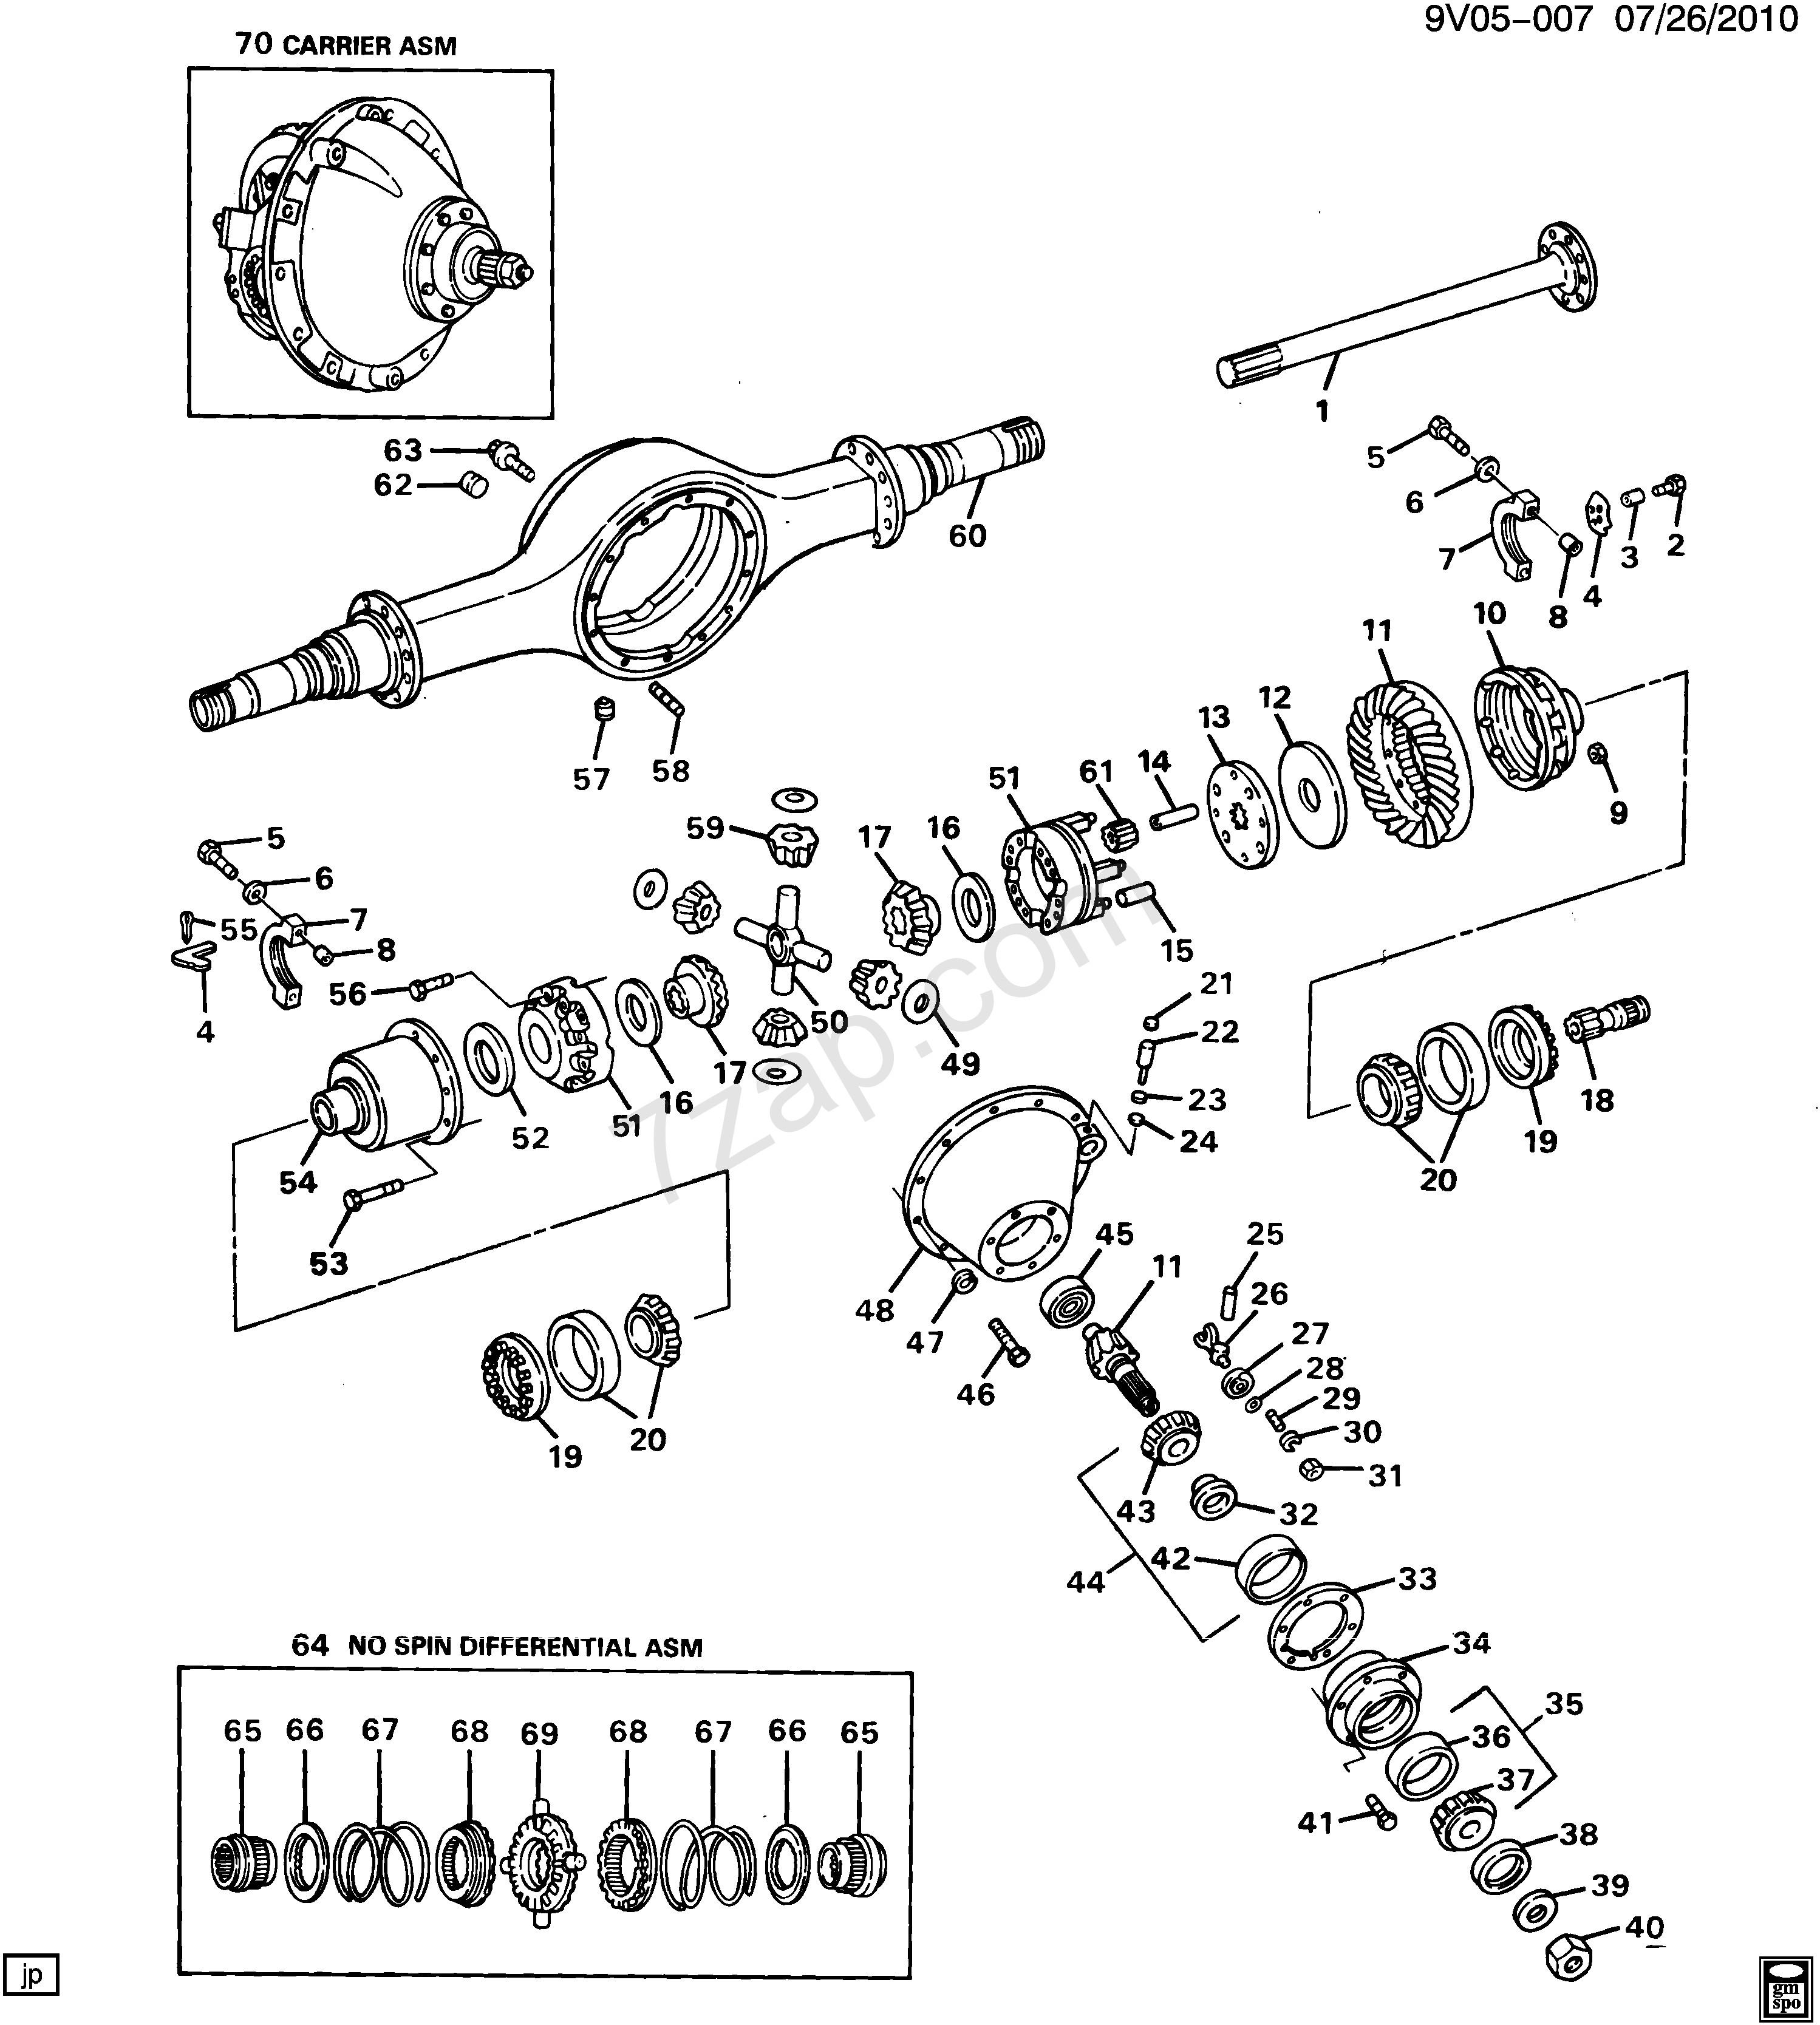 Dana 35 parts diagram 2002 2008 c7h0 42 rear axle eaton two speed t dana 35 parts diagram 2002 2008 c7h0 42 rear axle eaton two speed t hph part ccuart Image collections